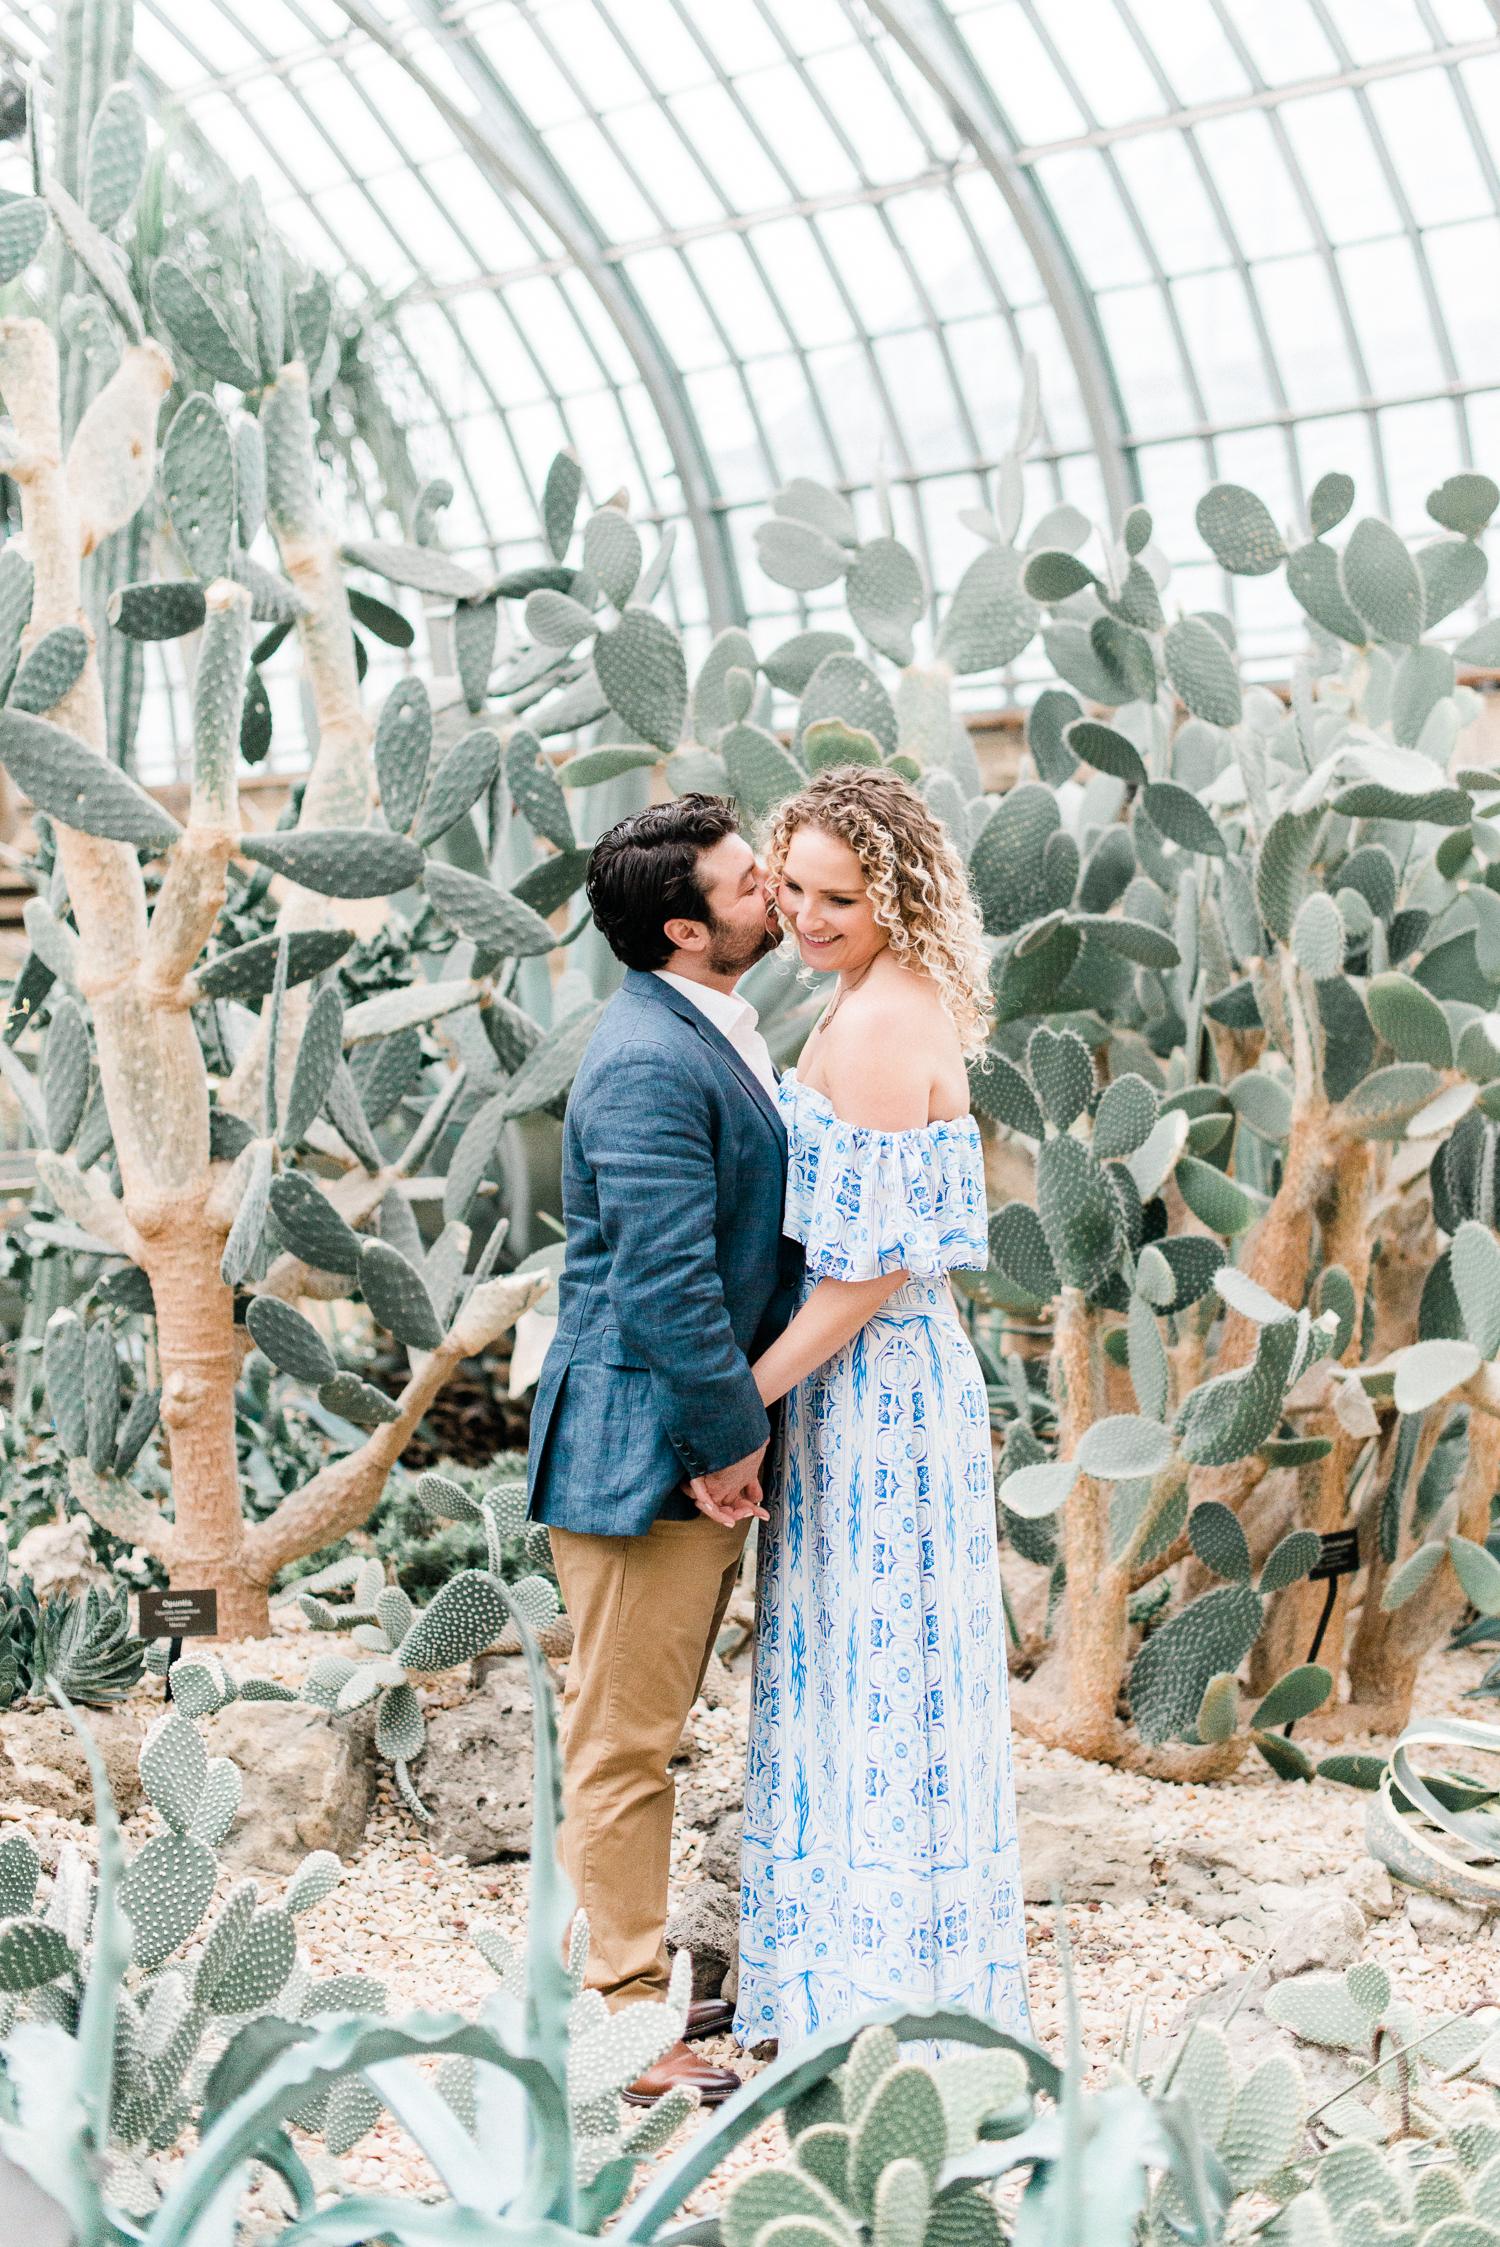 Brittany Bekas - Chicago Las Vegas Engagement Photographer-48.jpg